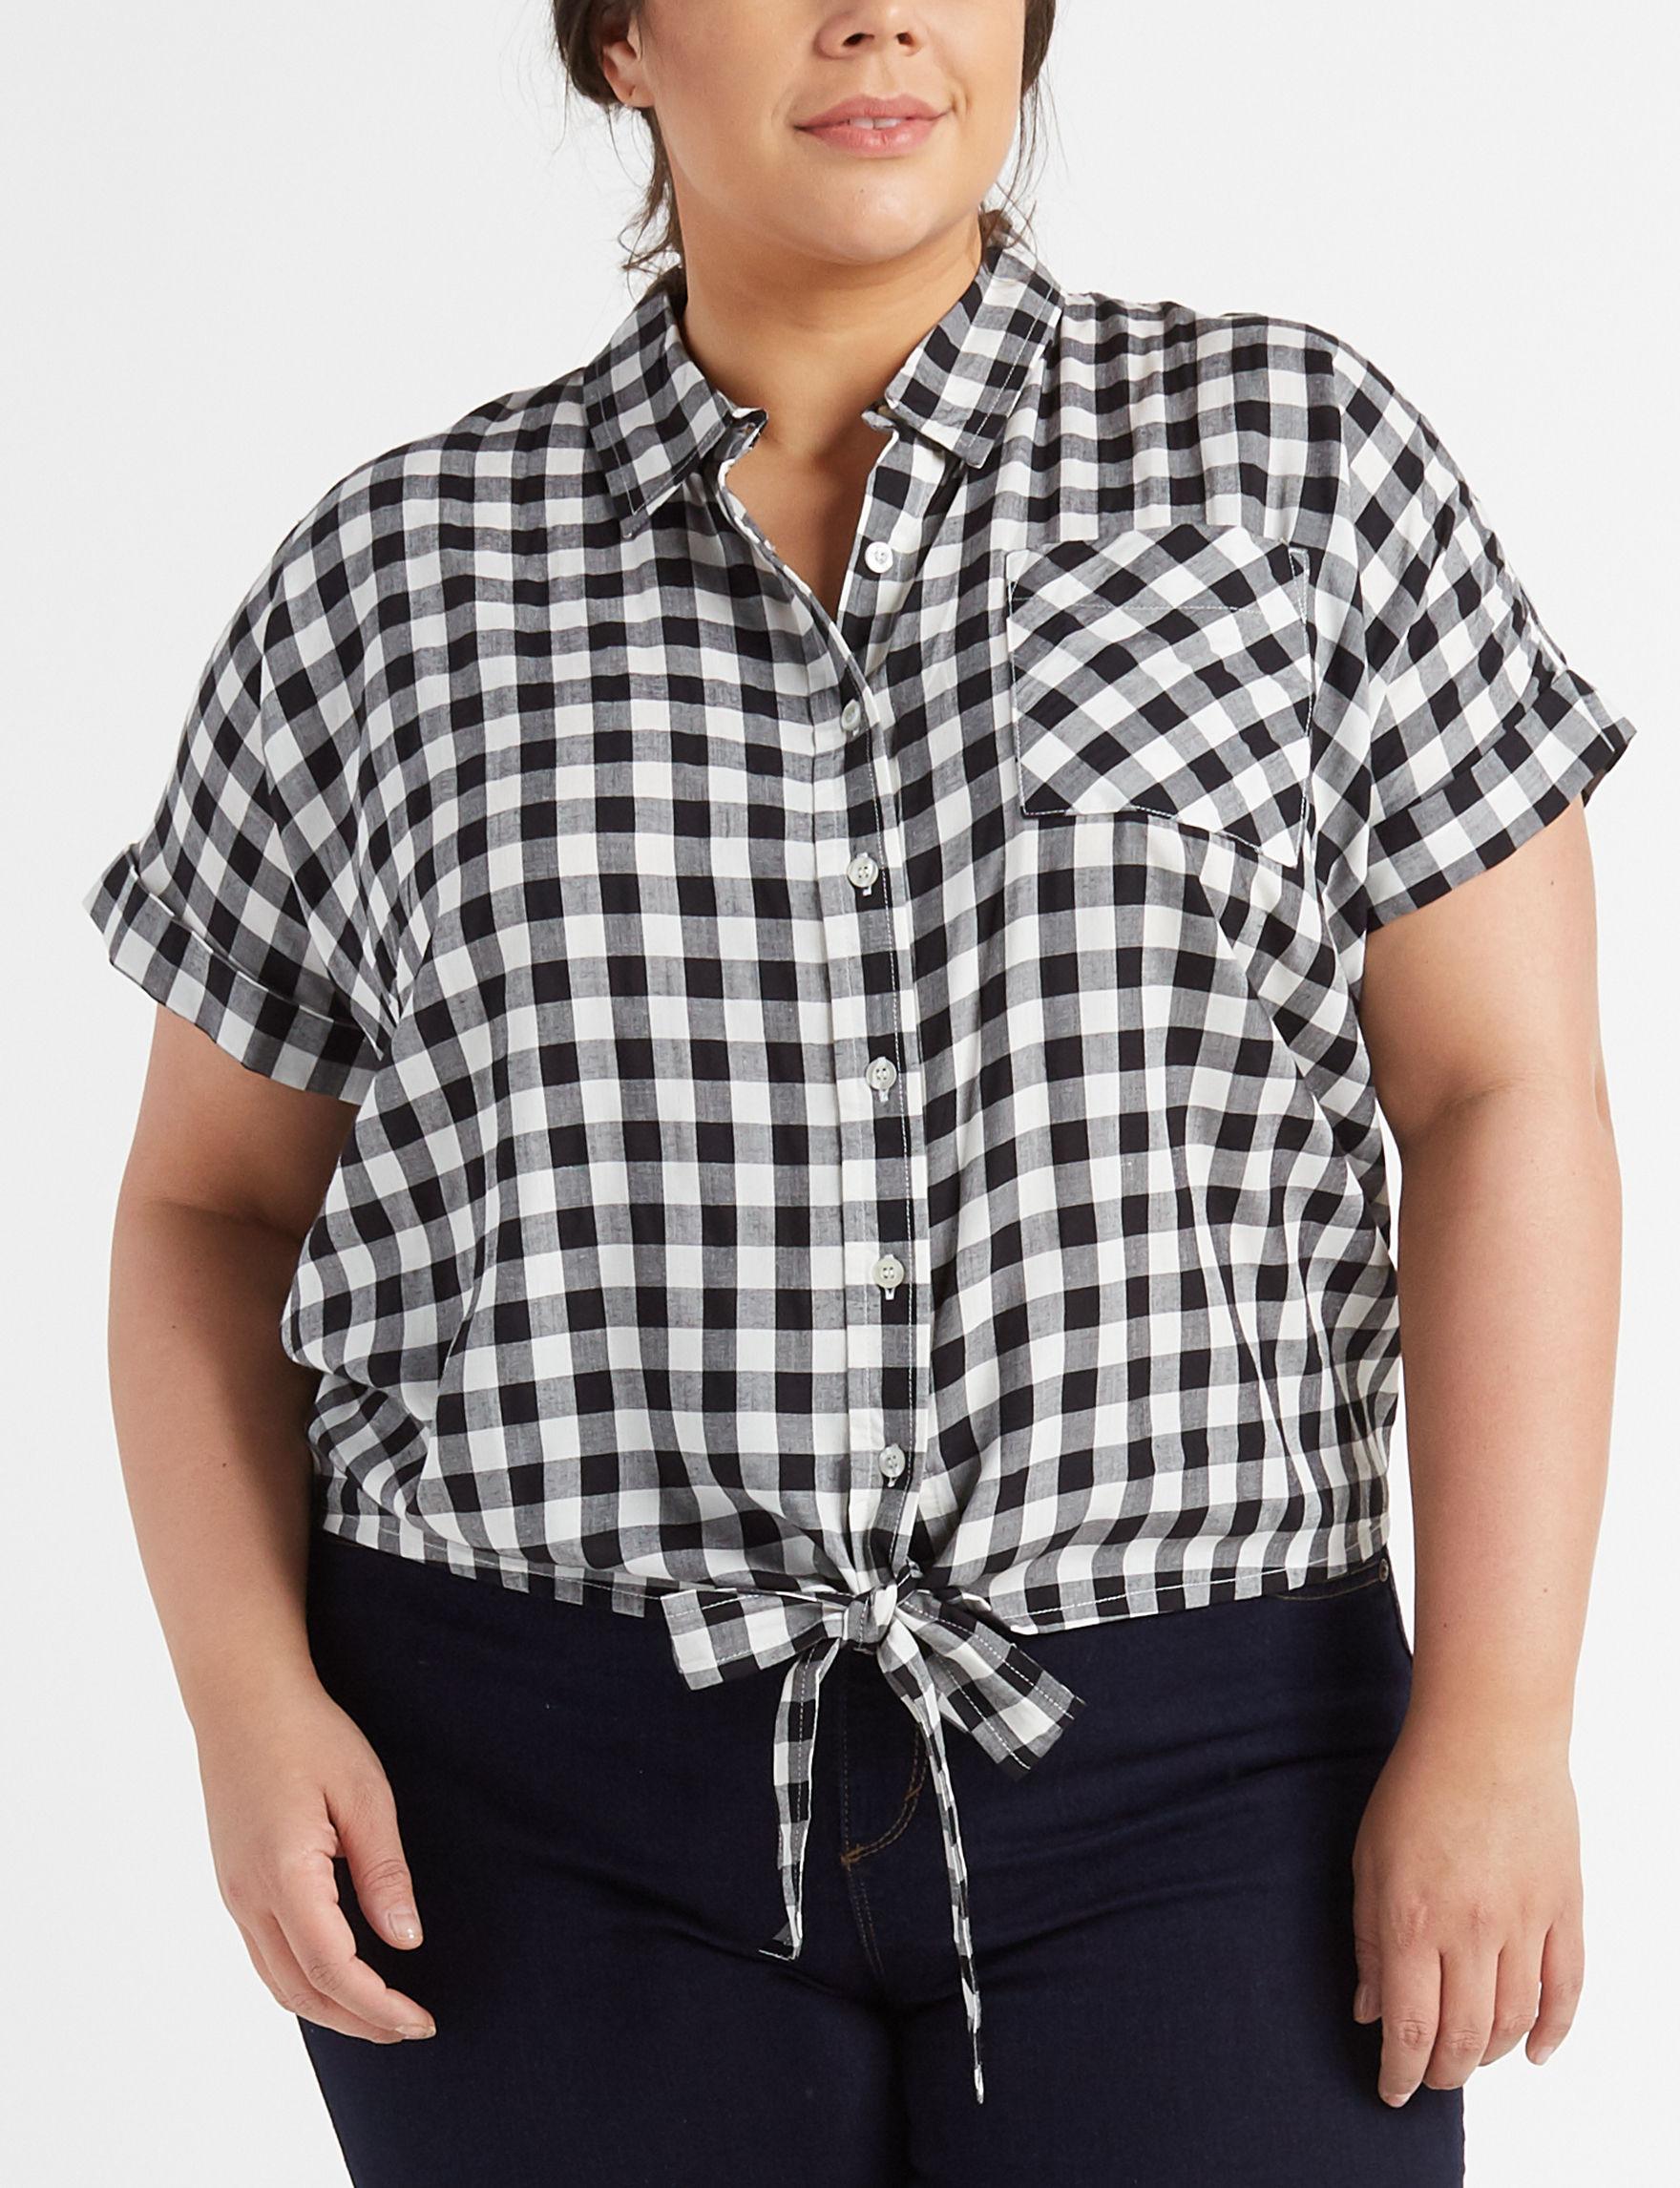 New Direction White / Black Shirts & Blouses